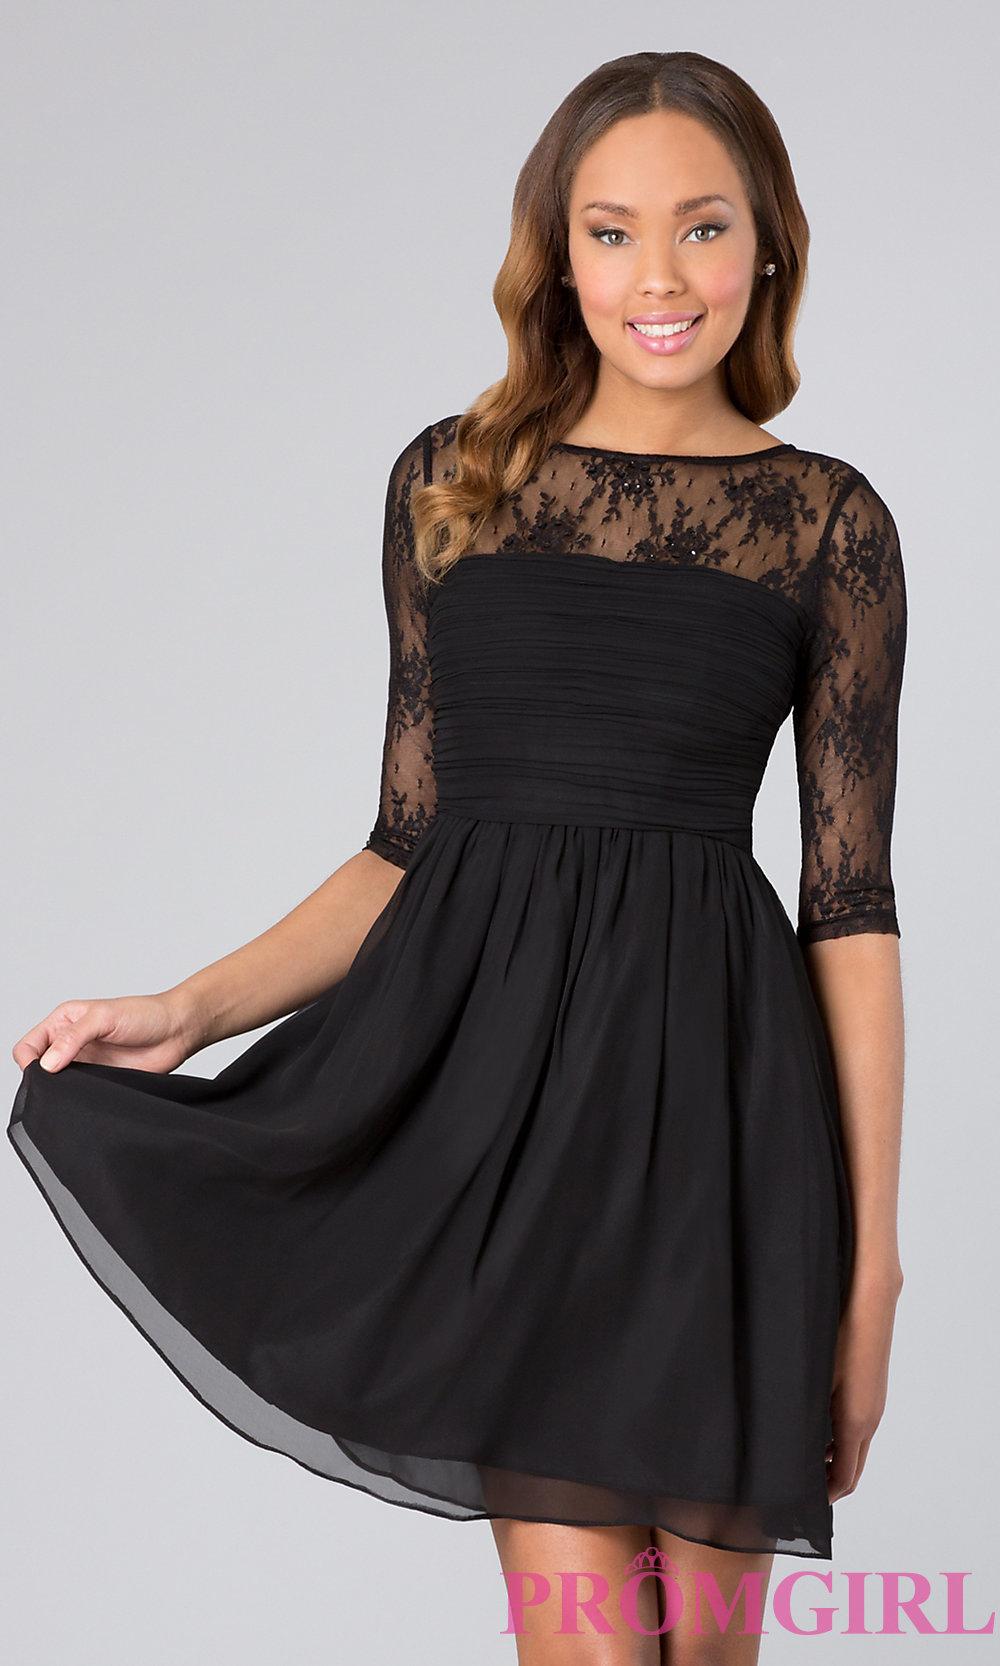 Long sleeve short prom dresses